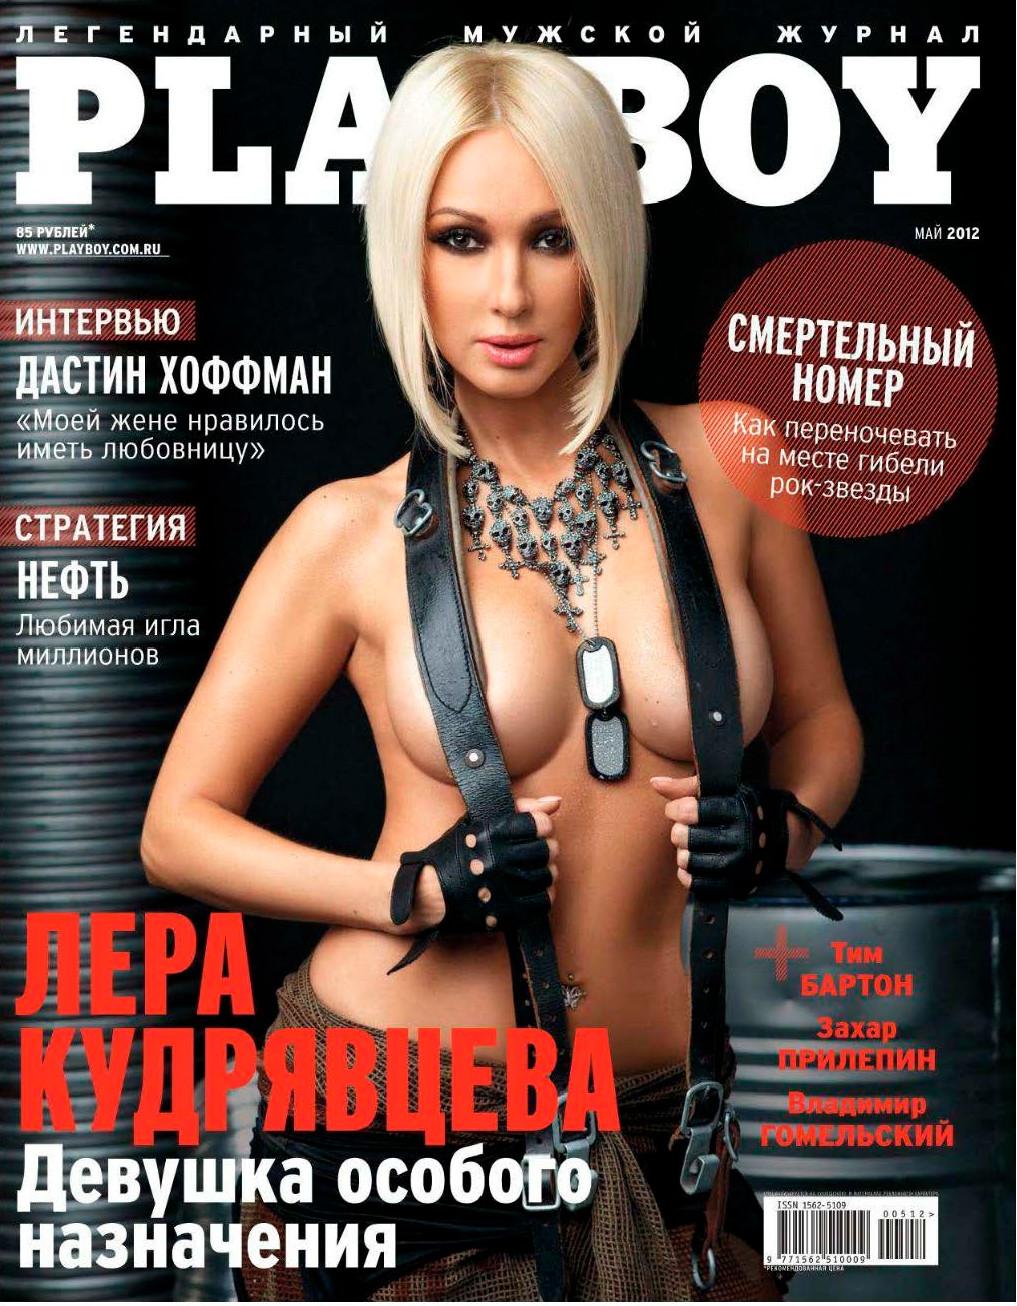 Картинки с эротических журналов, порно фото частного секса молодоженов